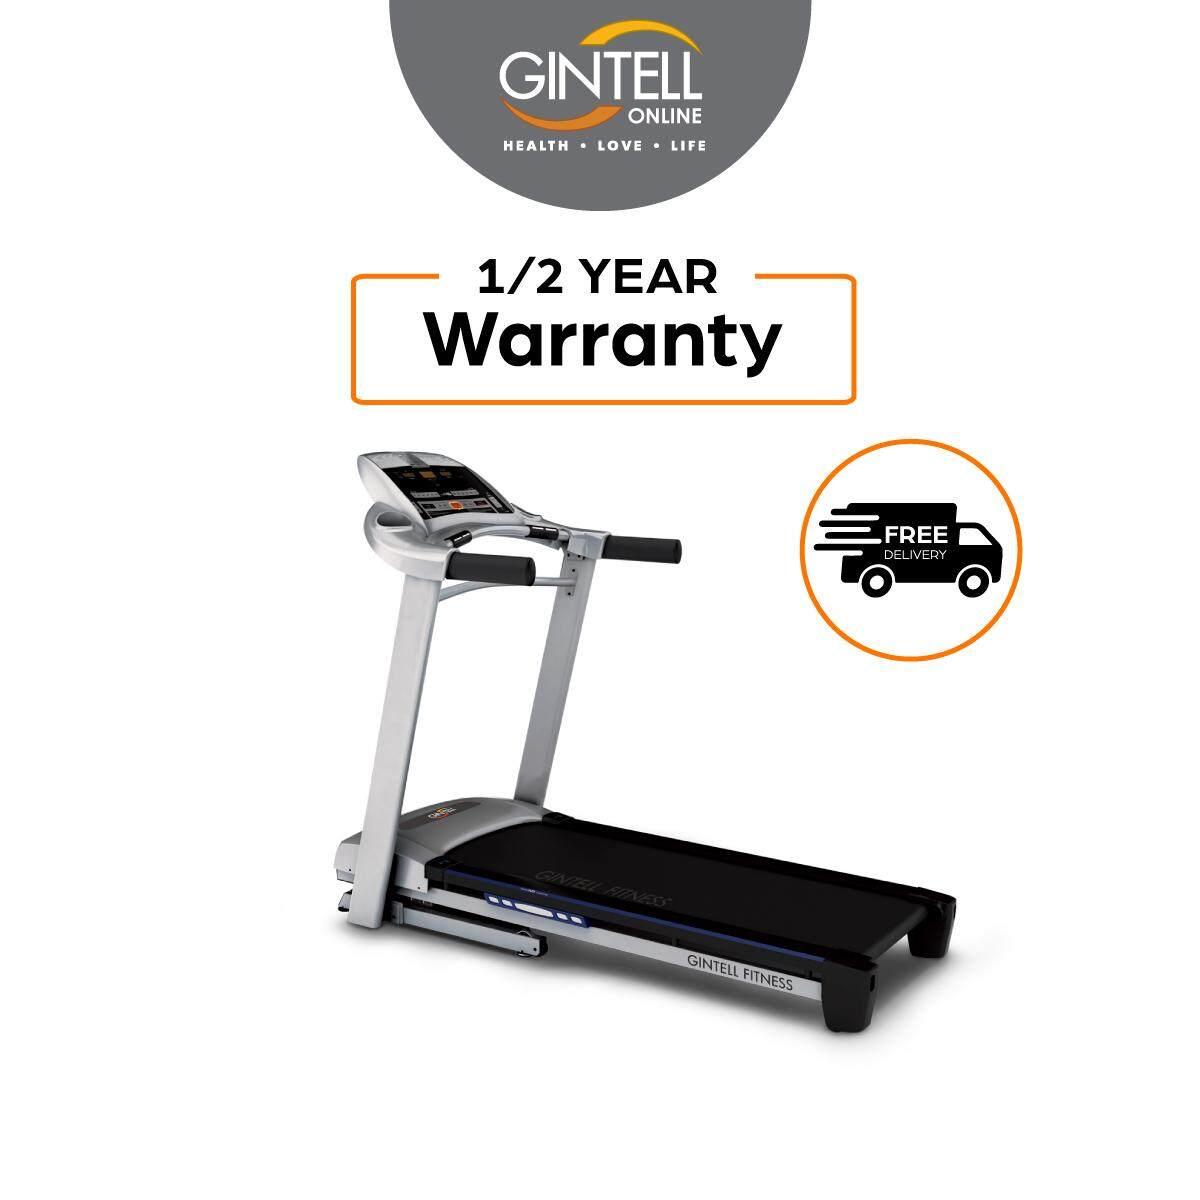 GINTELL FT3 Plus CyberAIR Plus Treadmill (Showroom Unit)